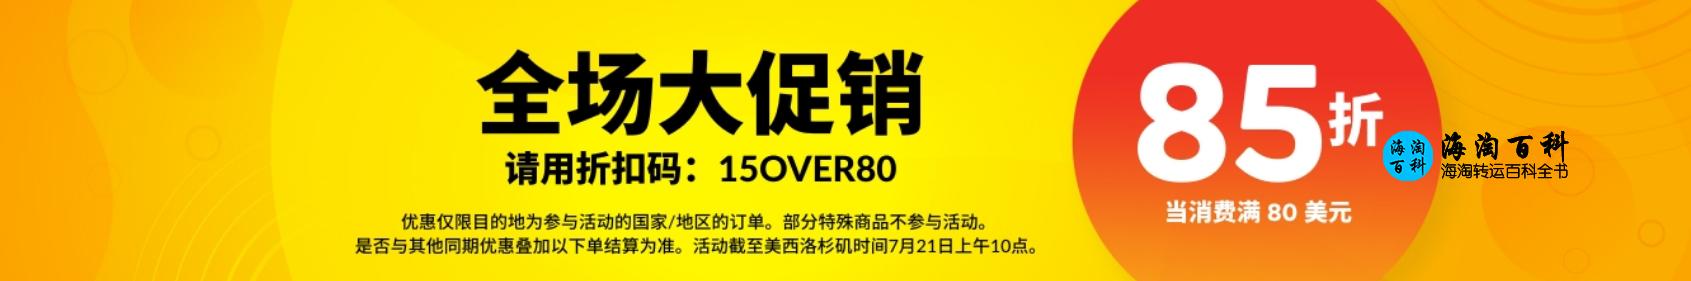 iHerb七月新优惠:限时大促销,专属折扣码15OVER80